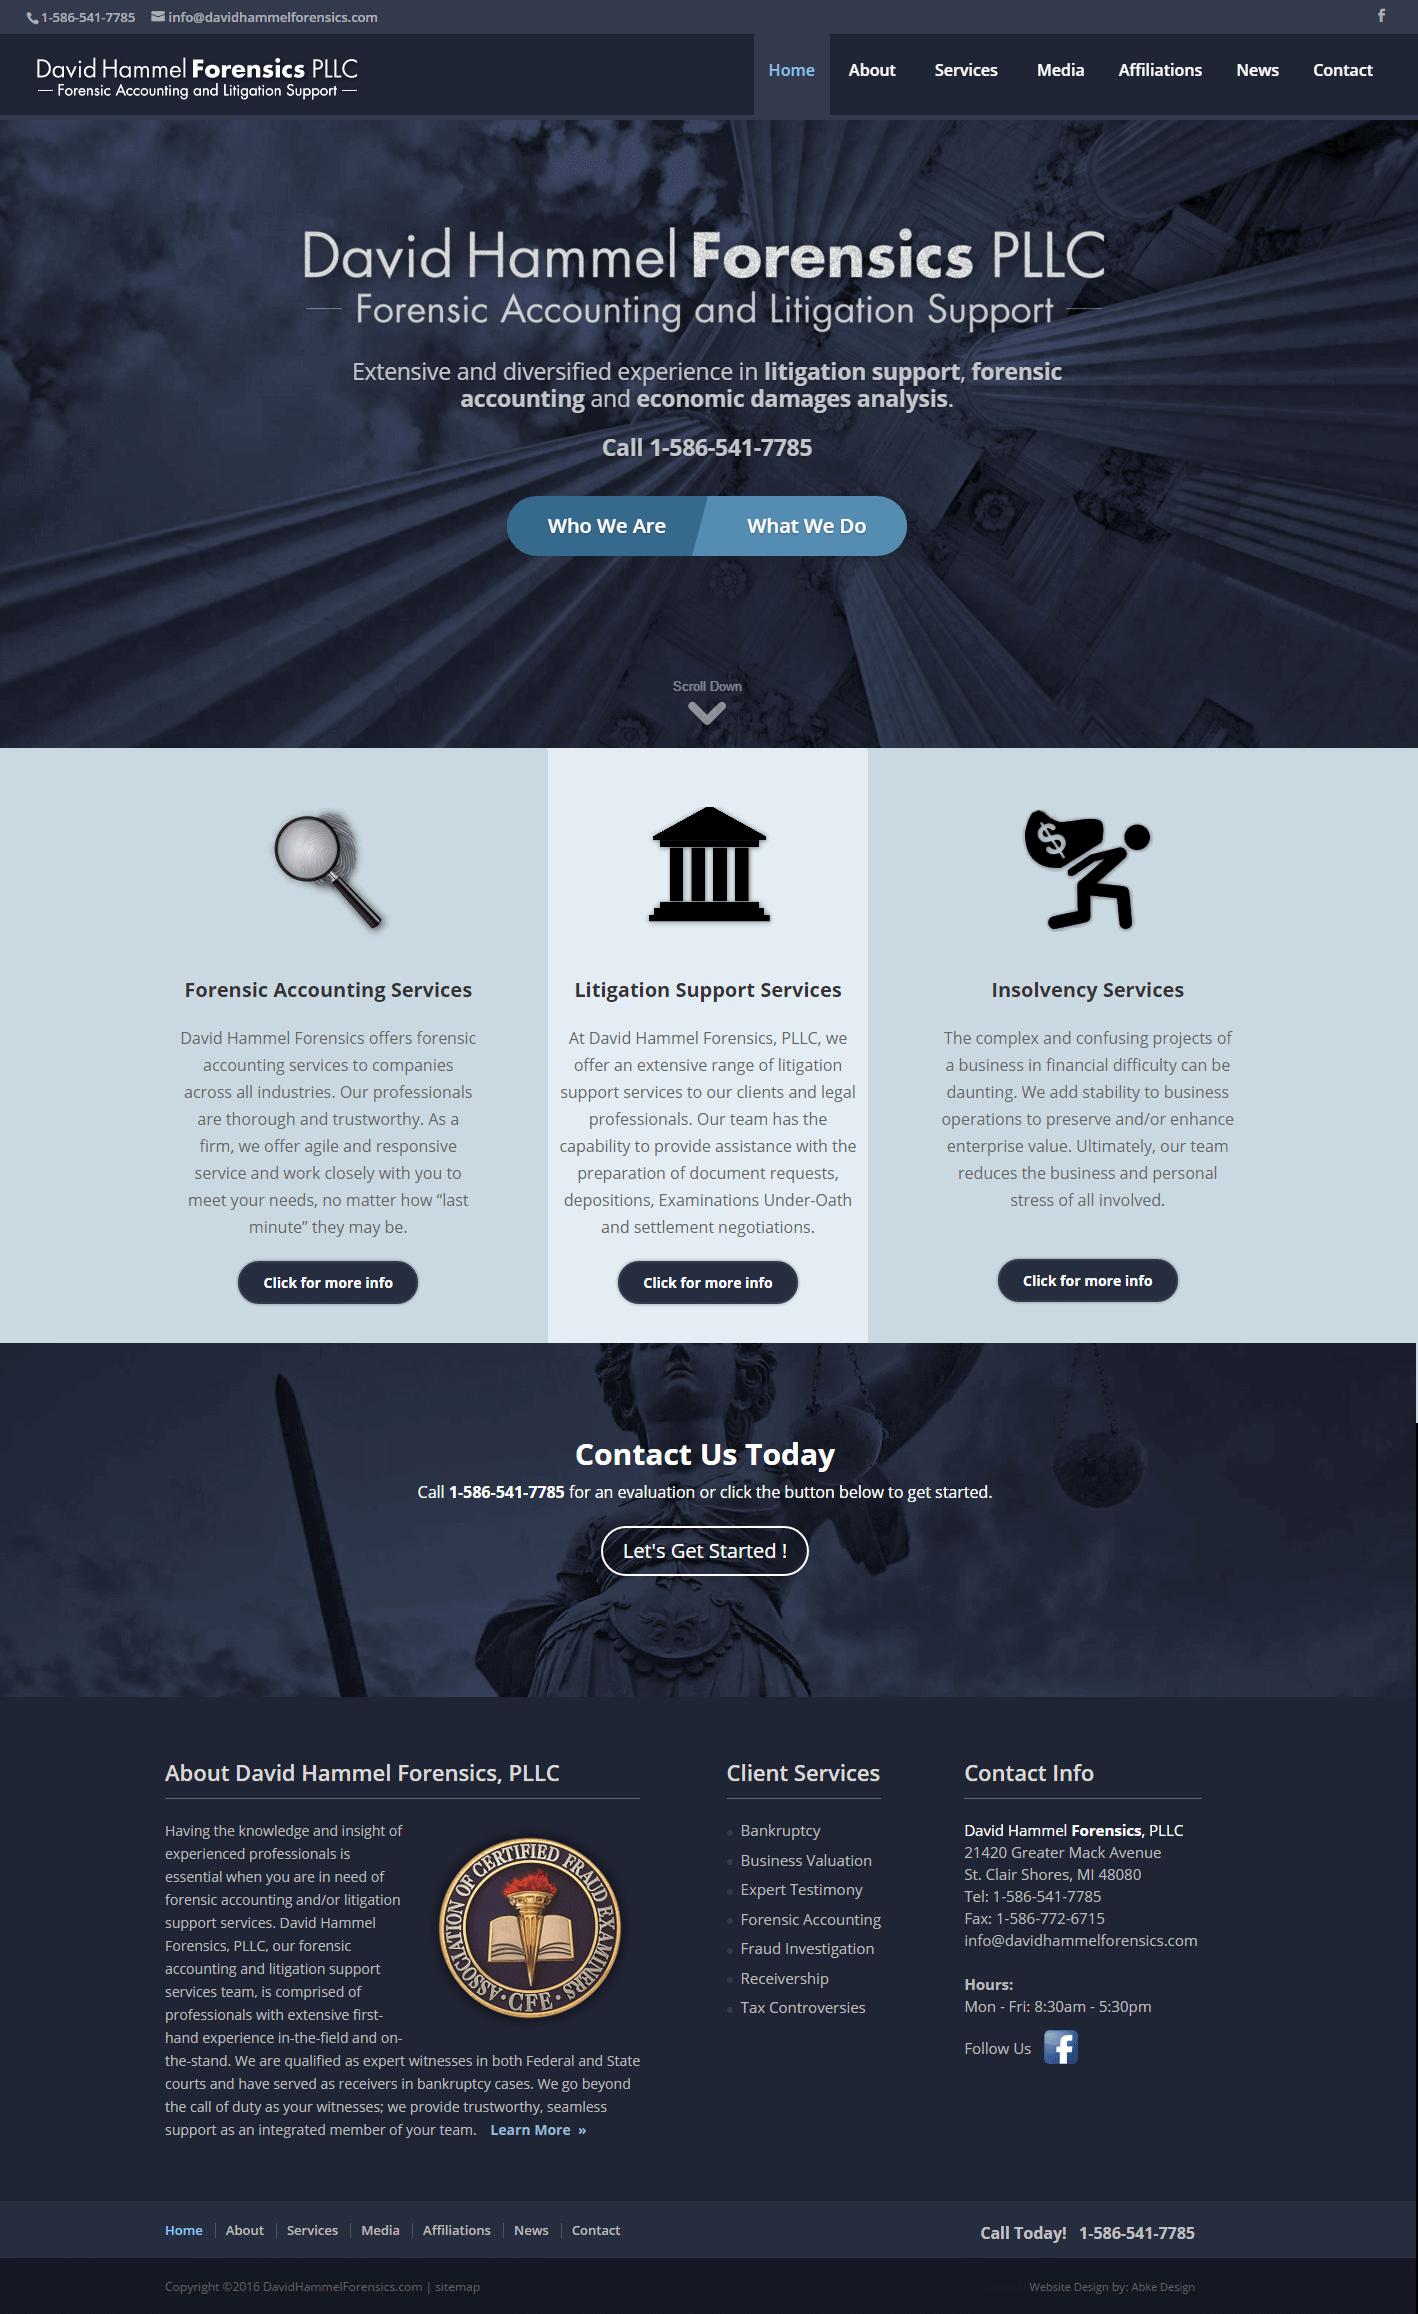 David Hammel Forensics - Website Design & Development by Abke Design